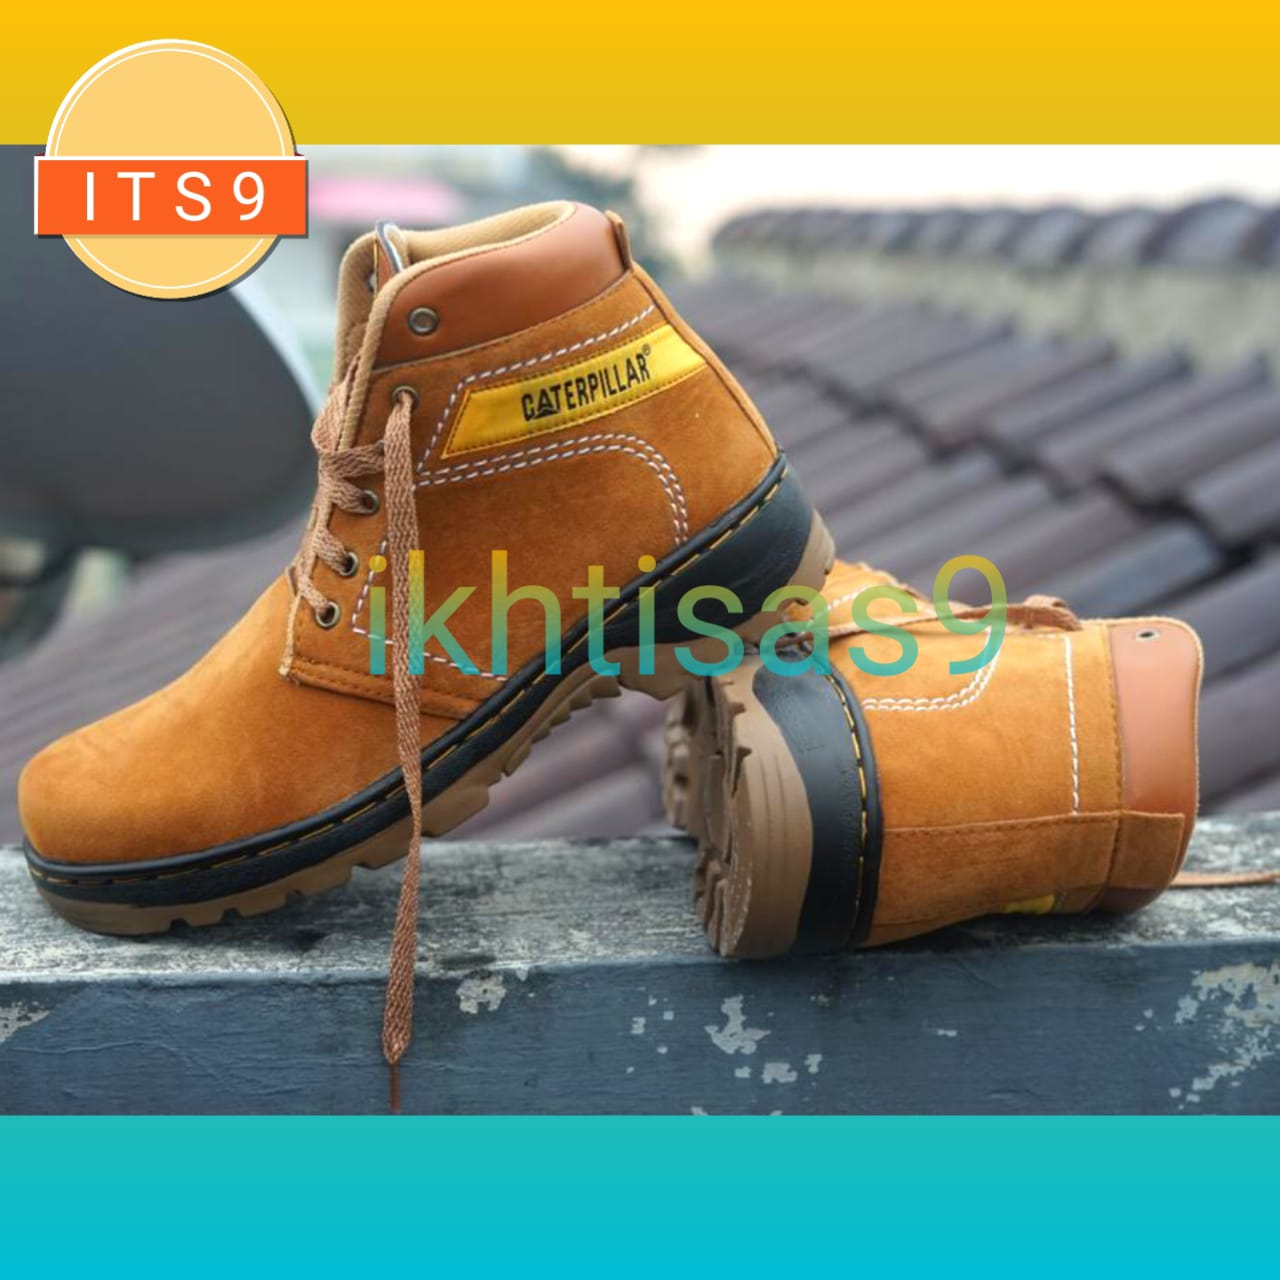 [ITS] -  Sepatu Boots Safety Formal Caterpillar Leather Oil Resistant Men Shoes + ( GRATIS SANDAL LAKI-LAKI )